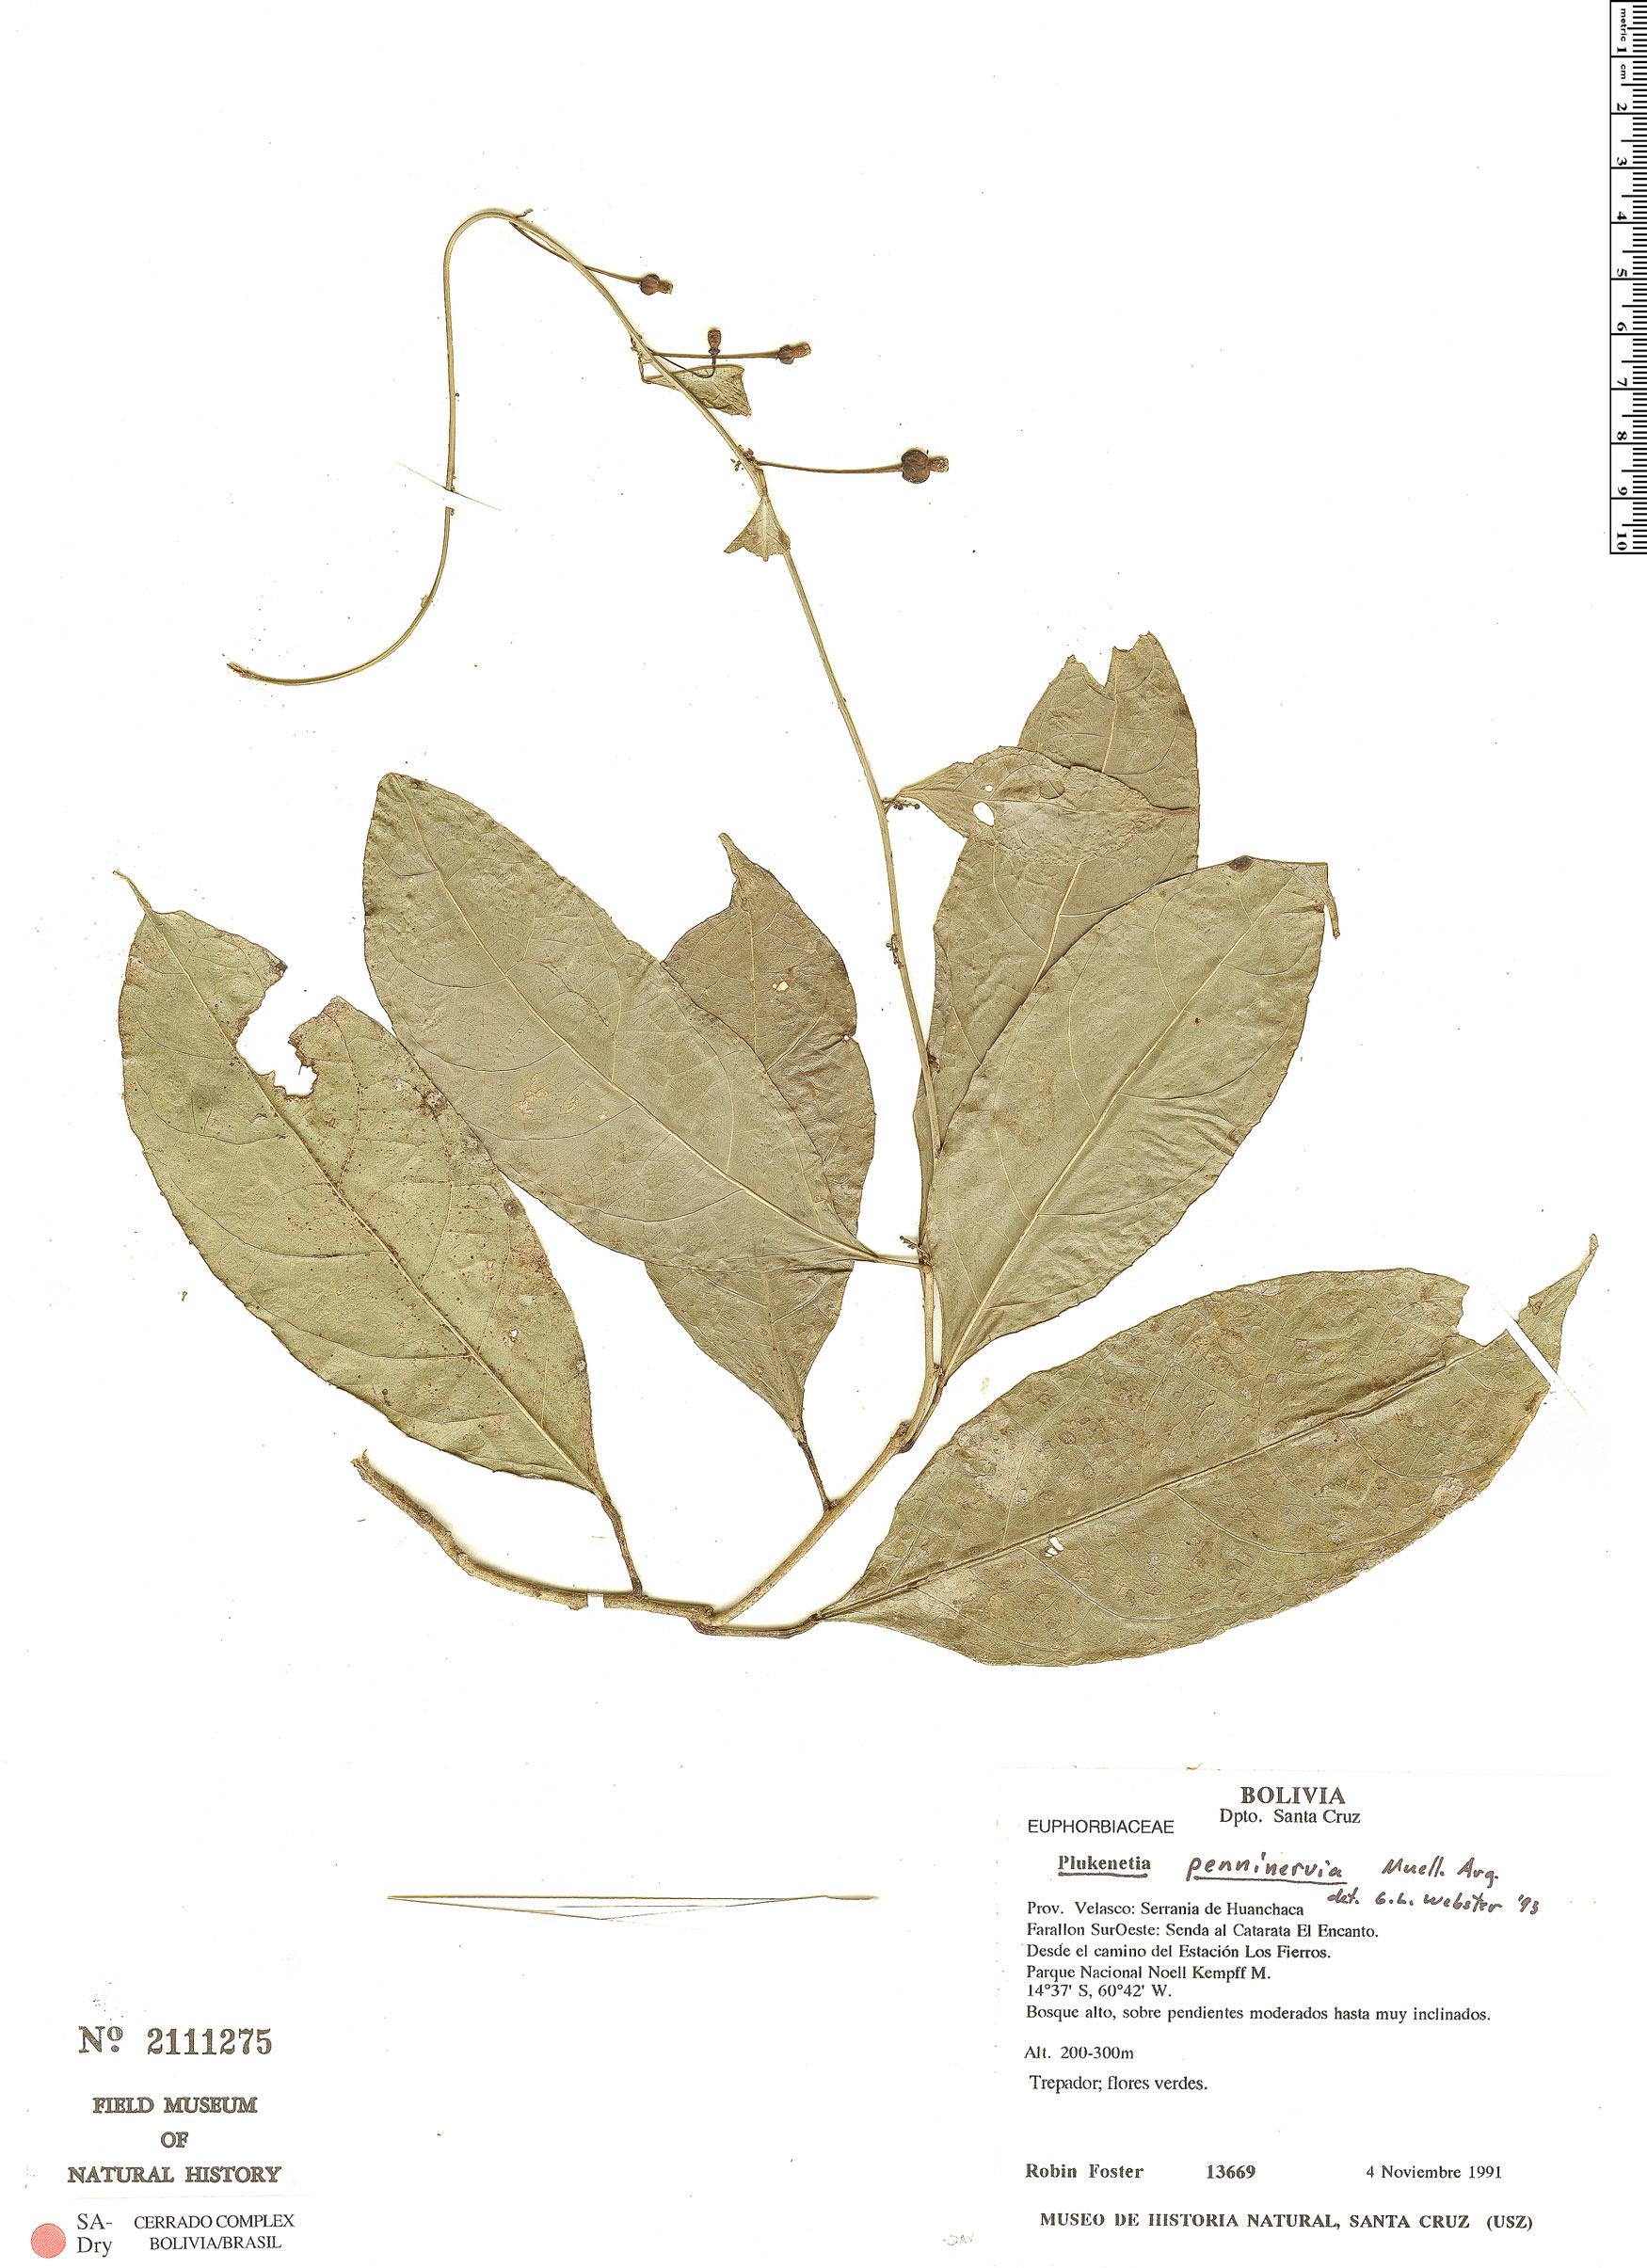 Specimen: Plukenetia penninervia